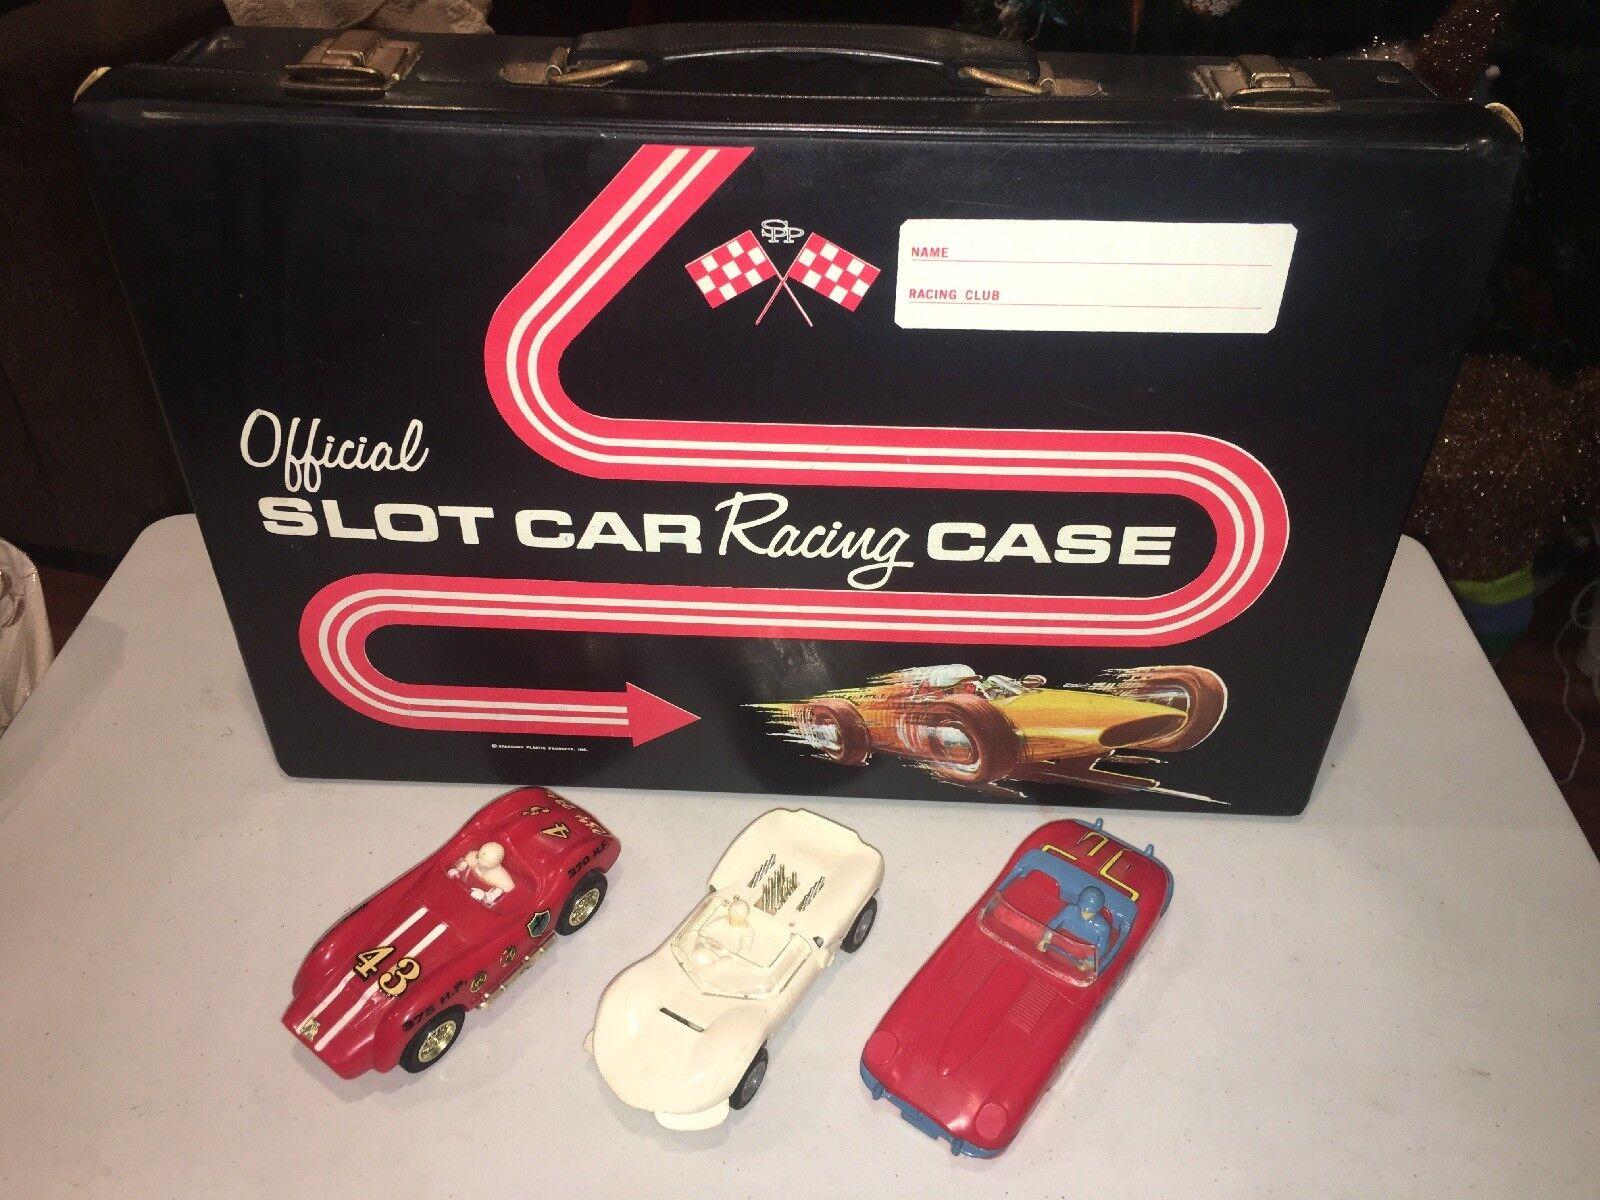 1960 ist slot car teilen viele cox - 1   24 skala & andere körper vintage - spielzeug